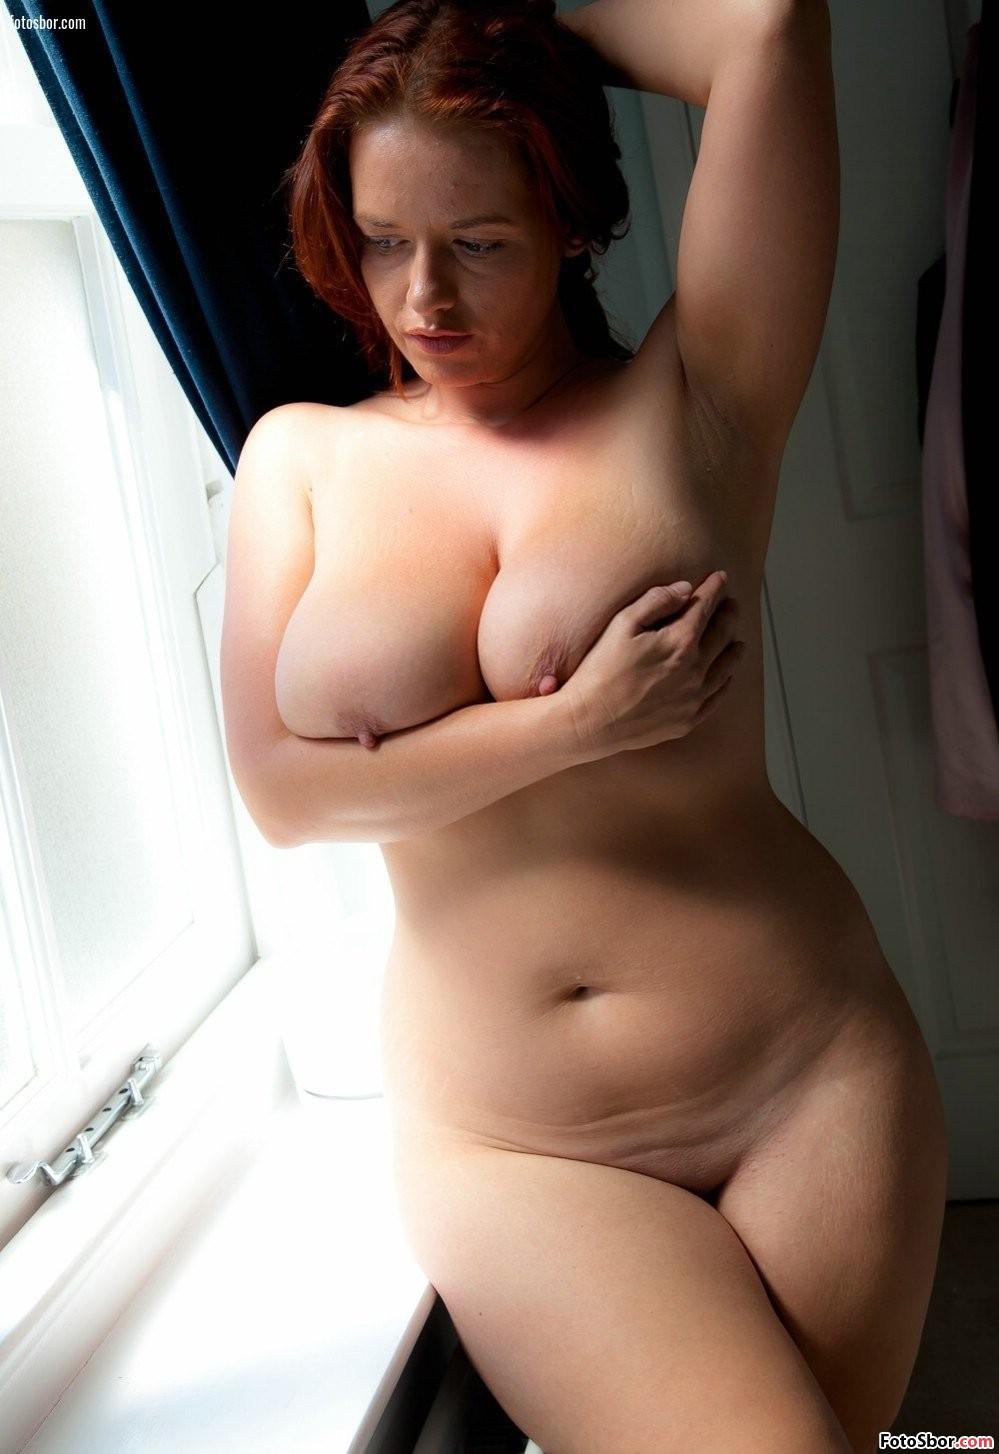 zaftig-women-nude